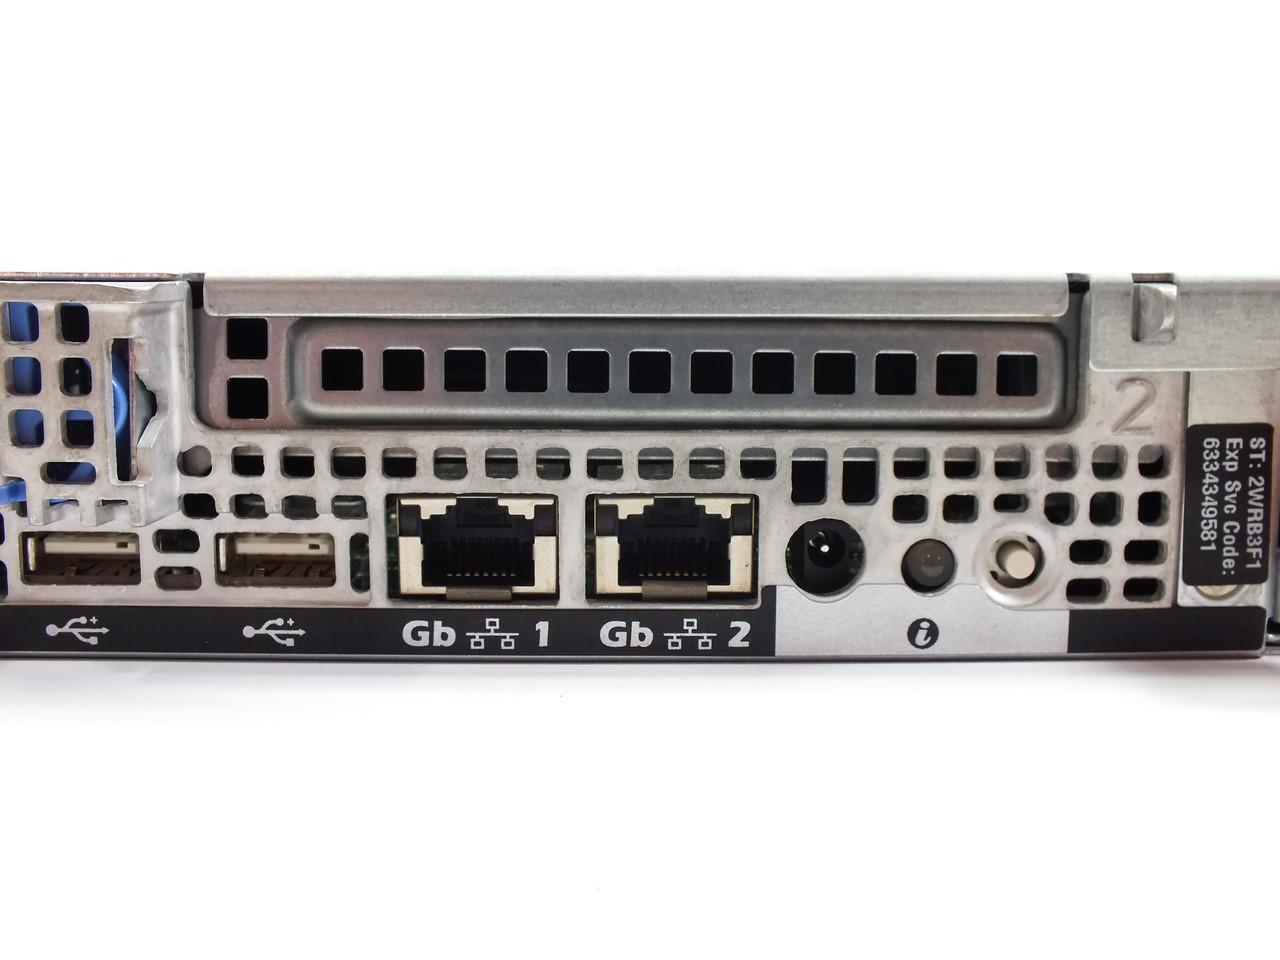 Dell Poweredge 1950 Intel Xeon Quad Core 1 6ghz Rackmount